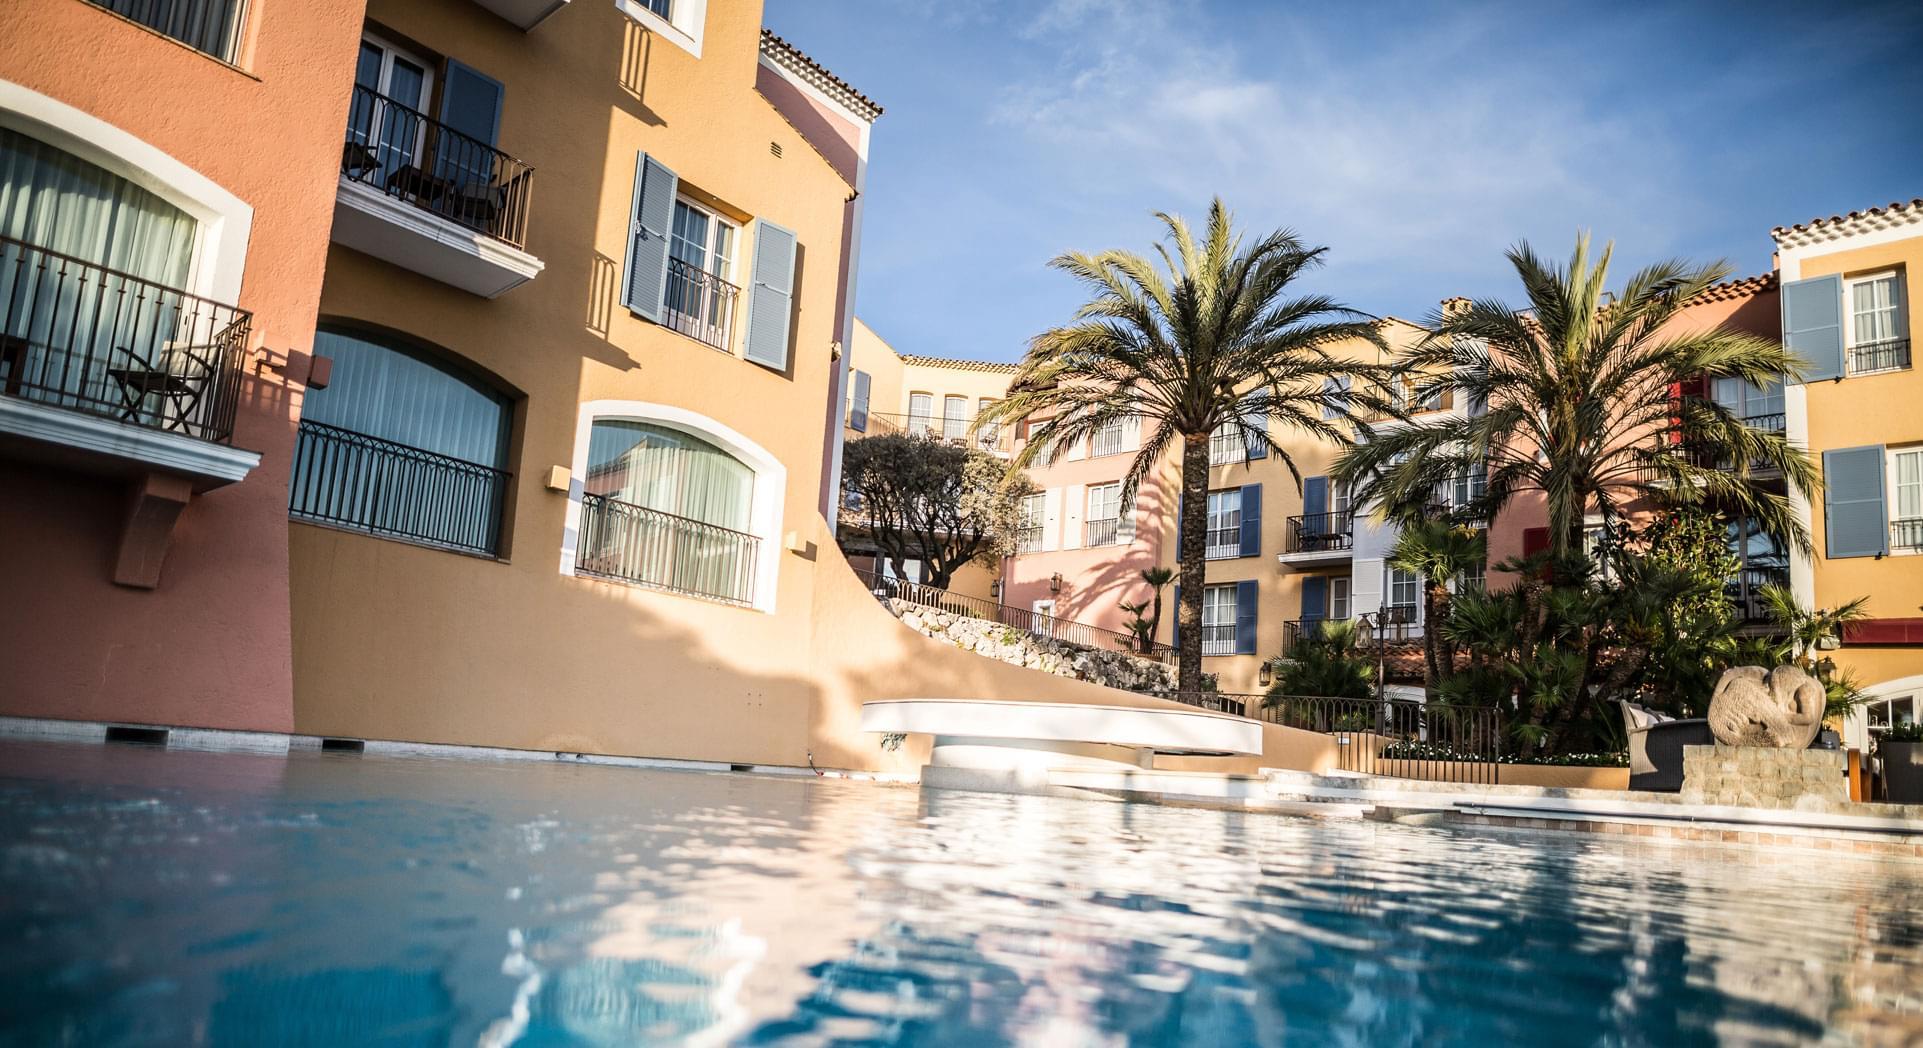 hotel byblos saint tropez piscine pool 1634